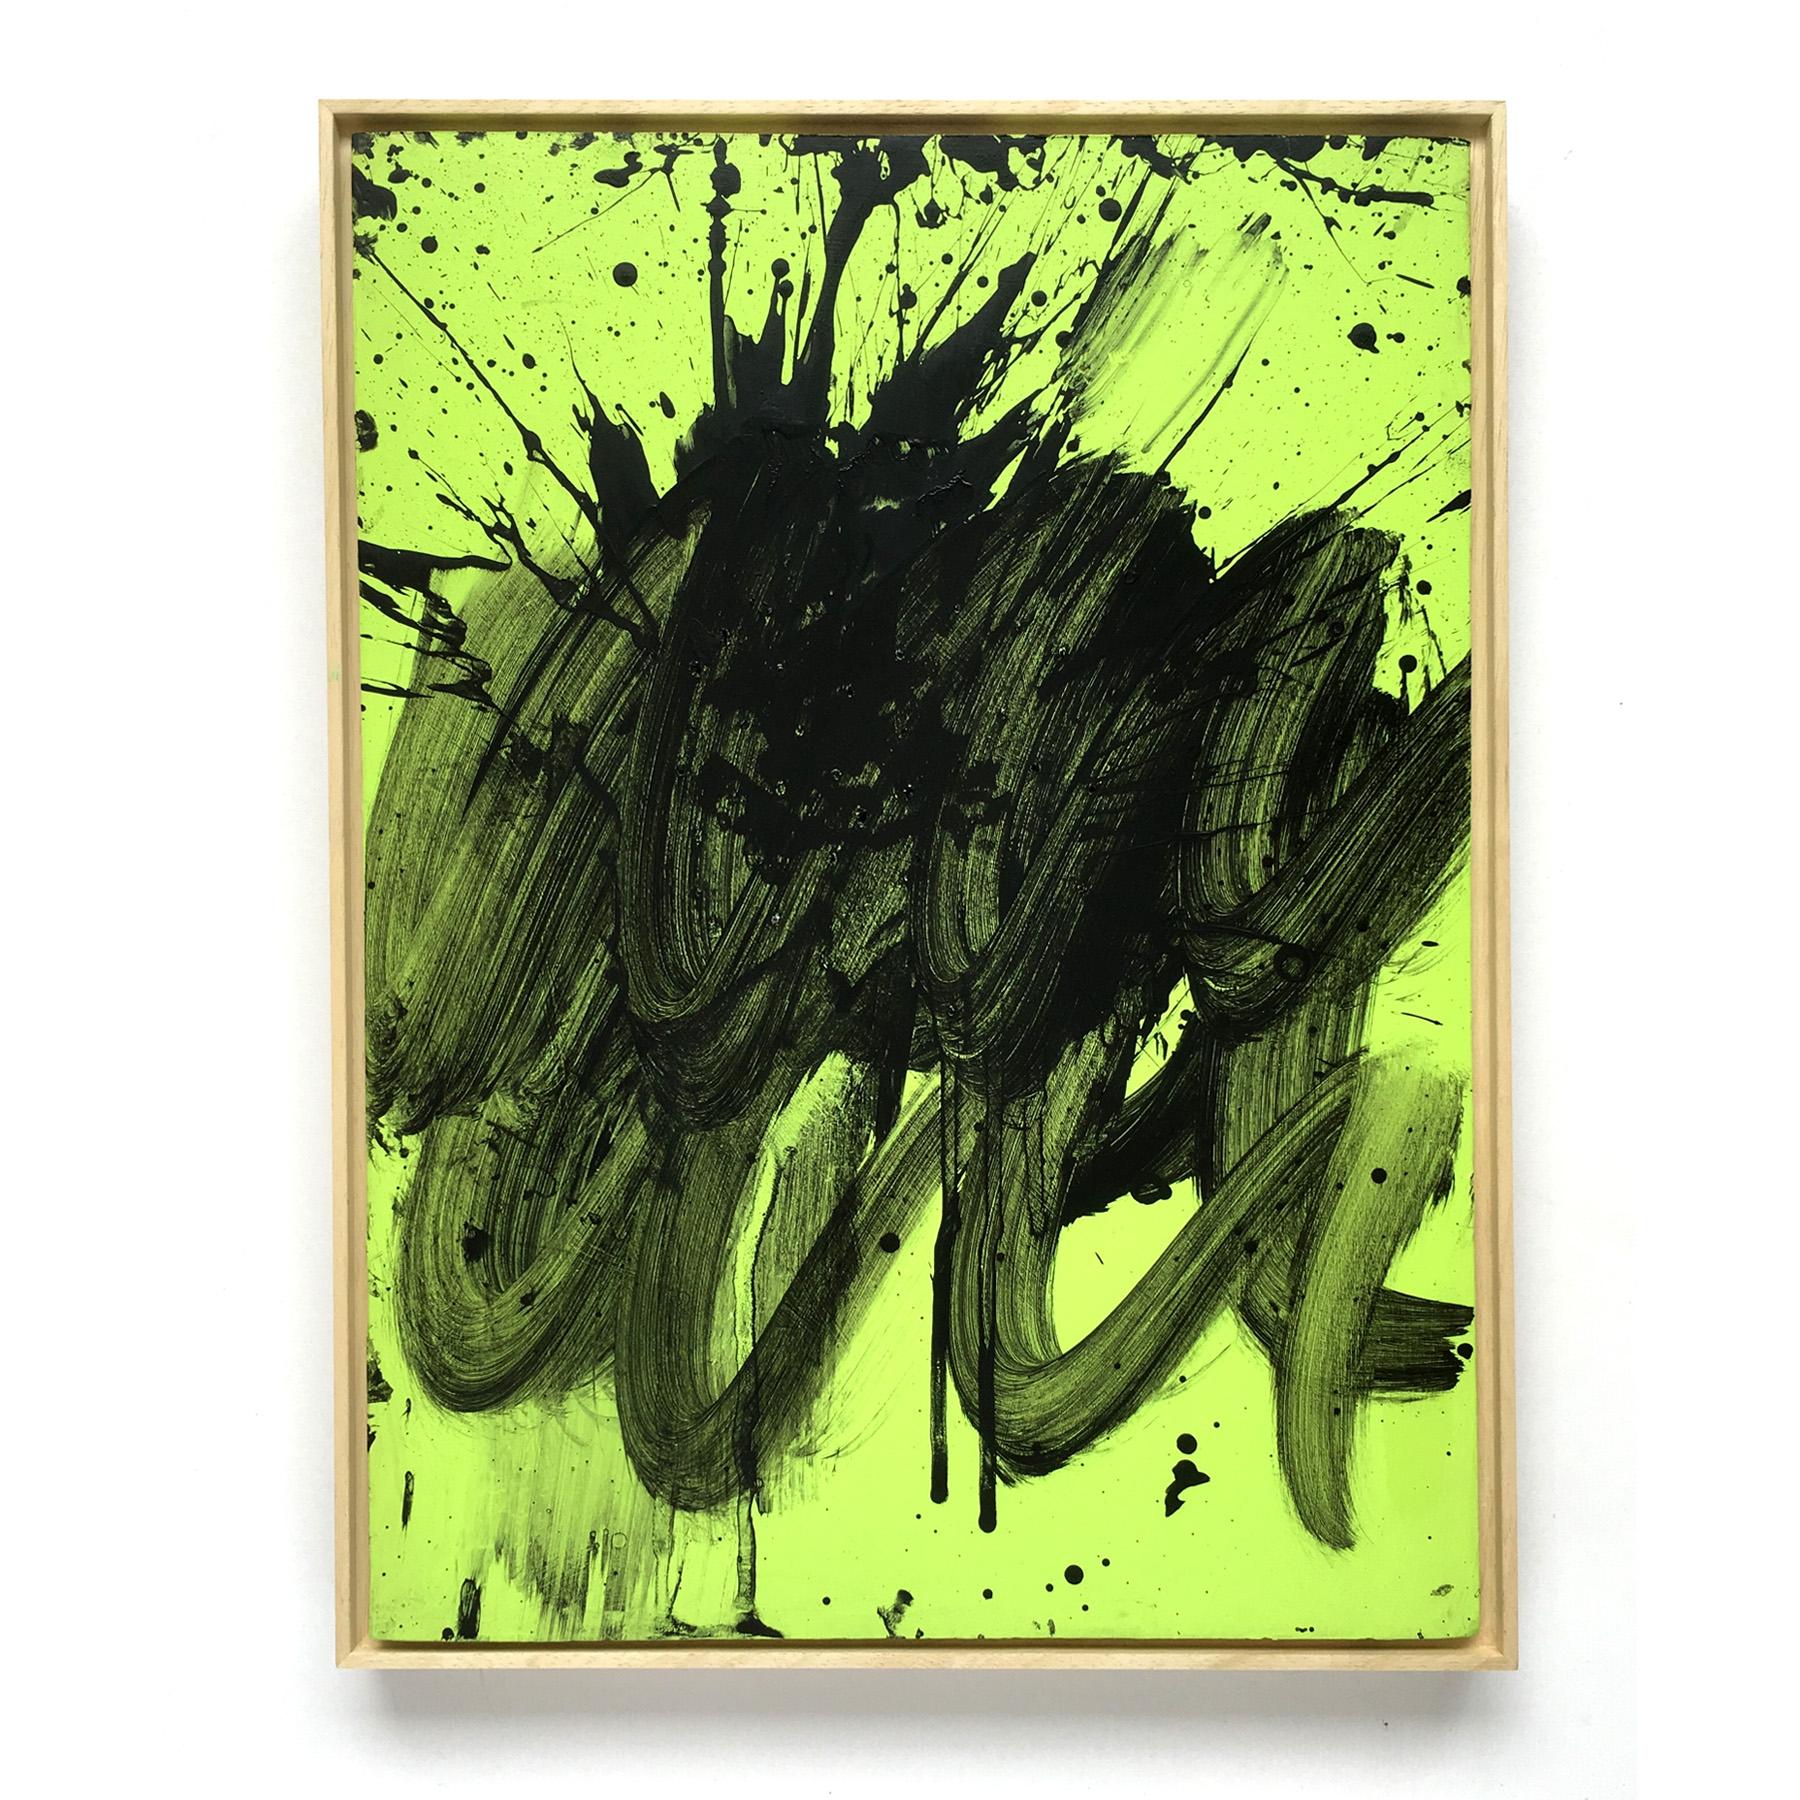 009 - Mike Edwards - Black Firework Painting 290919 (40x30cm).jpg